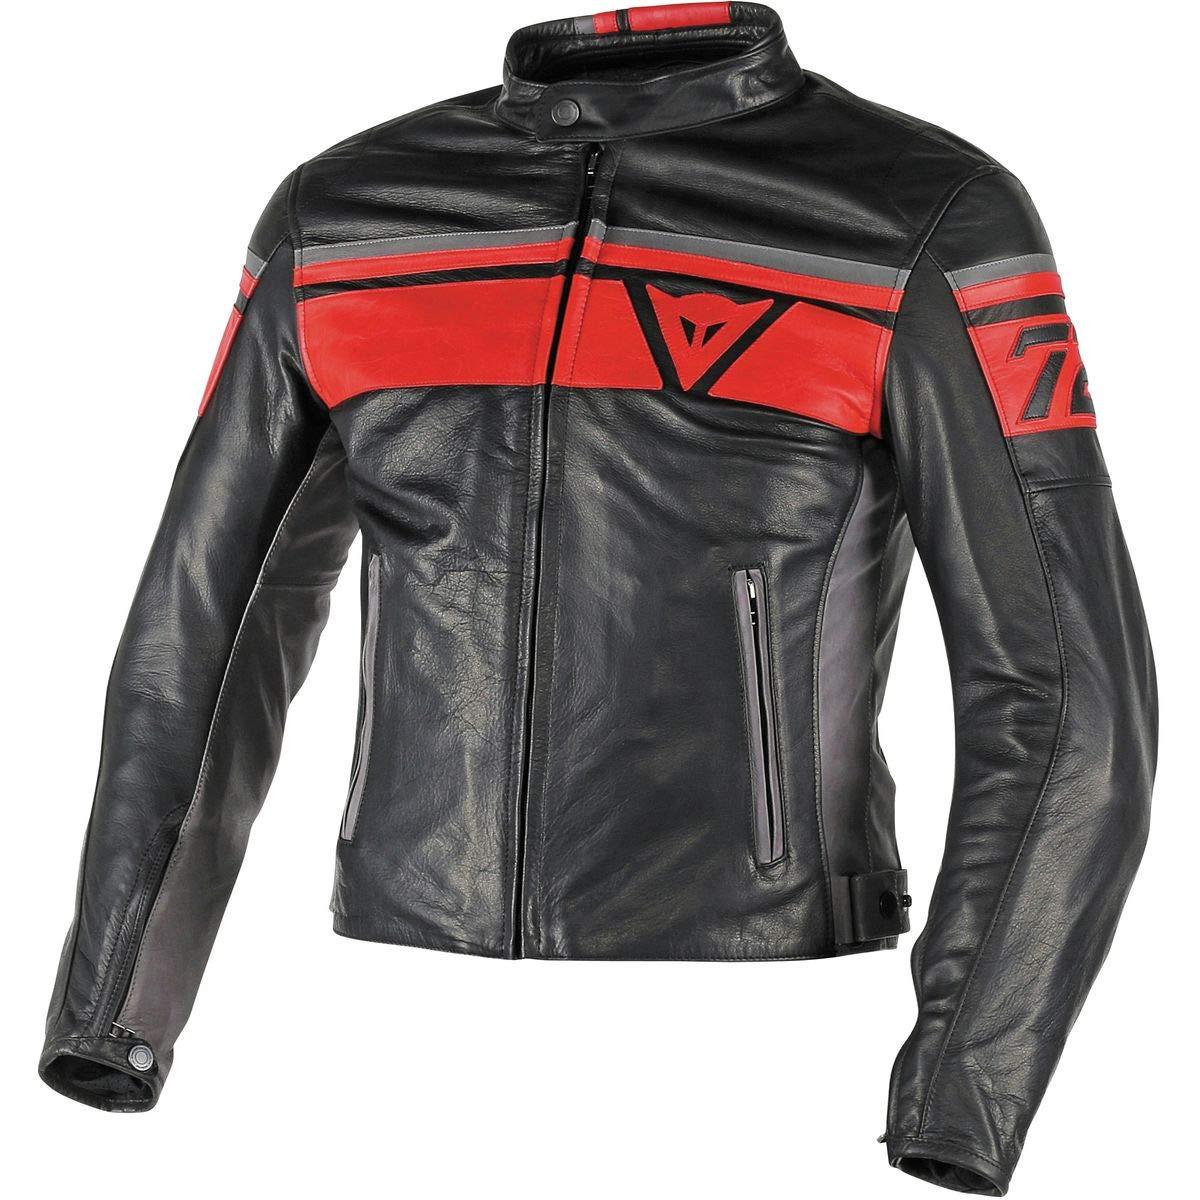 Dainese BLACKJACK Motorrad Lederjacke schwarz rot smoke